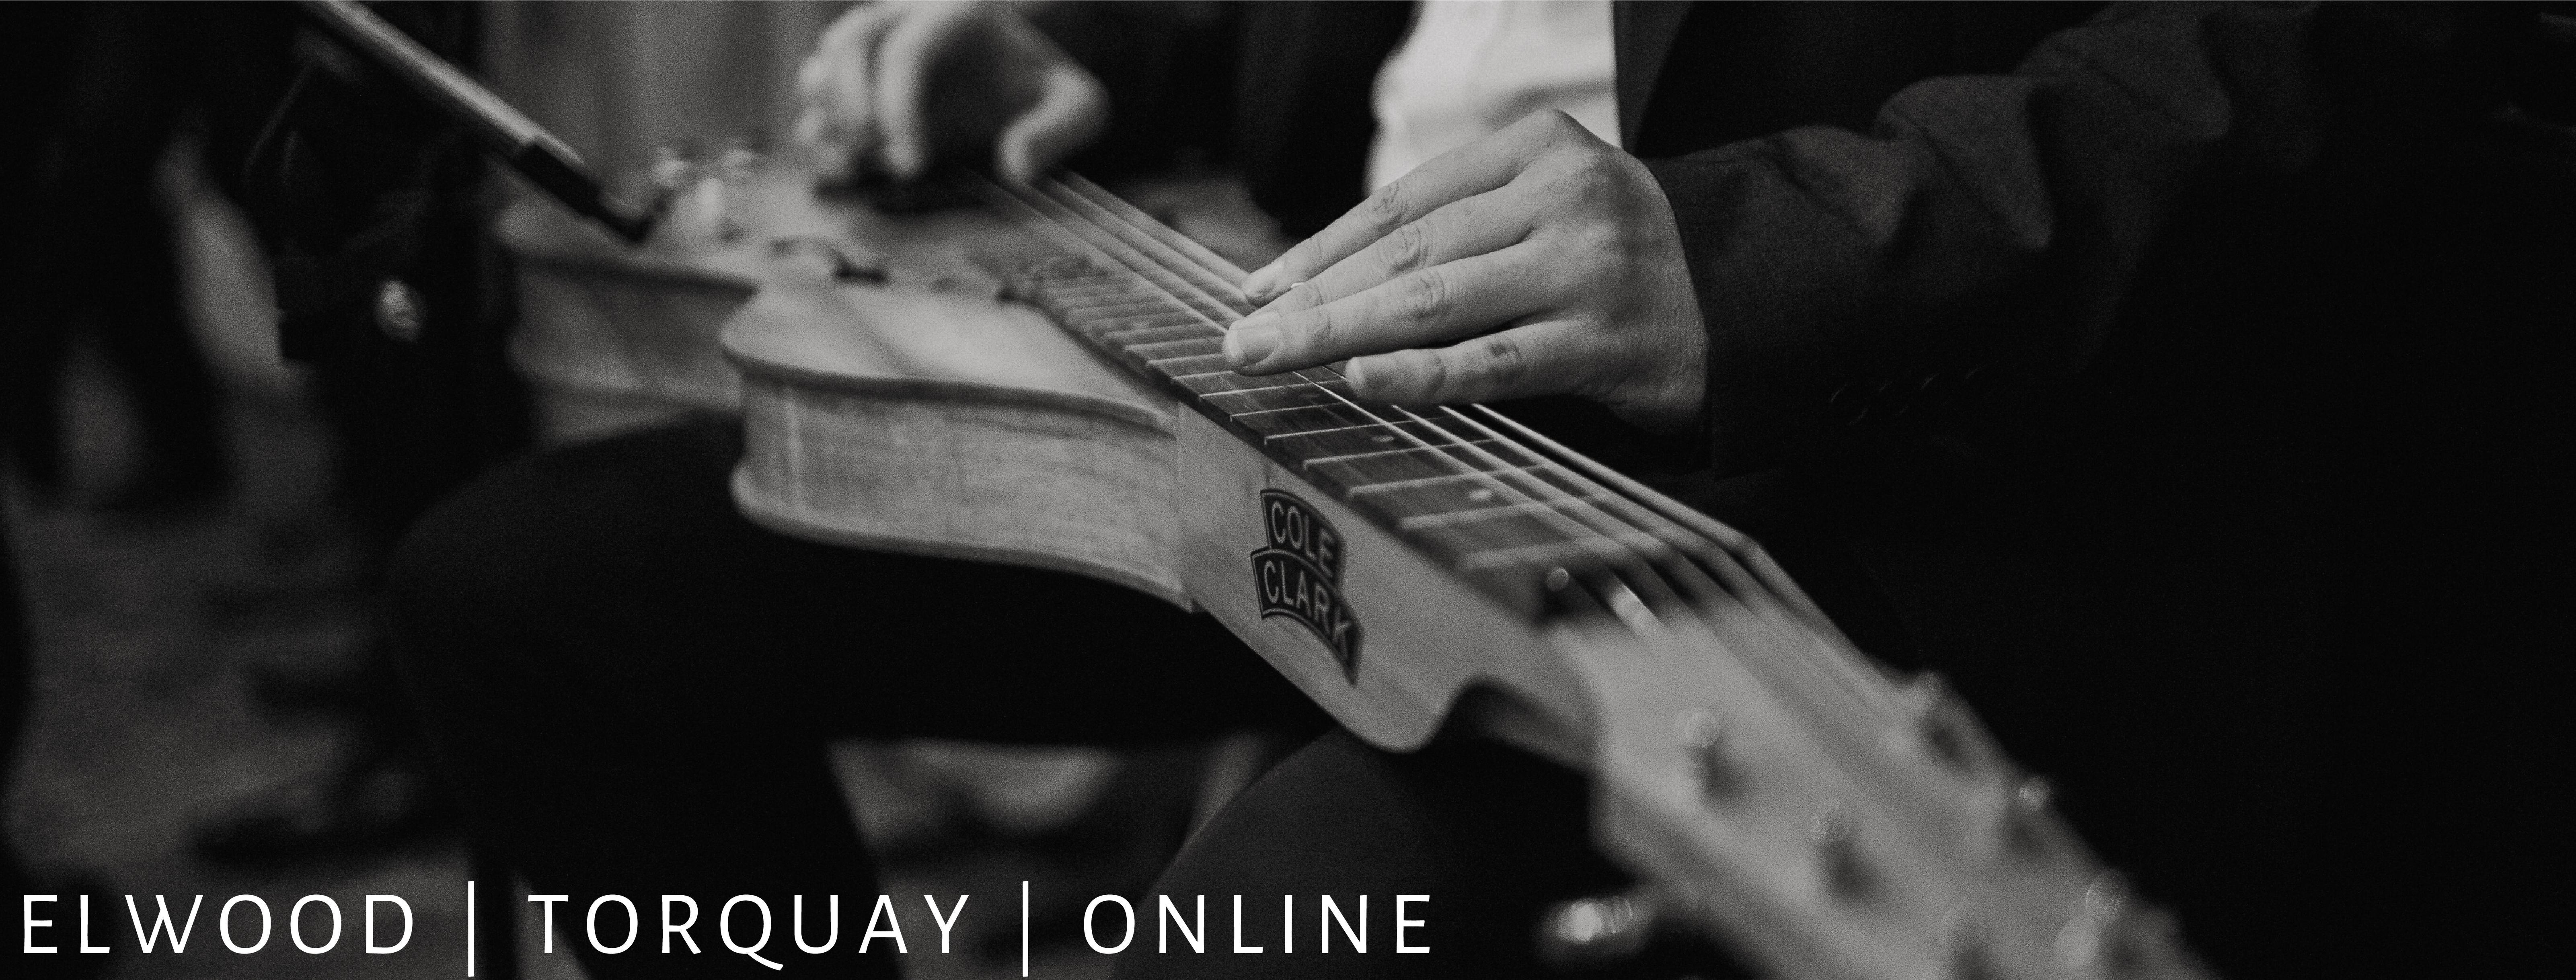 ELWOOD TORQUAY ONLINE-page-001